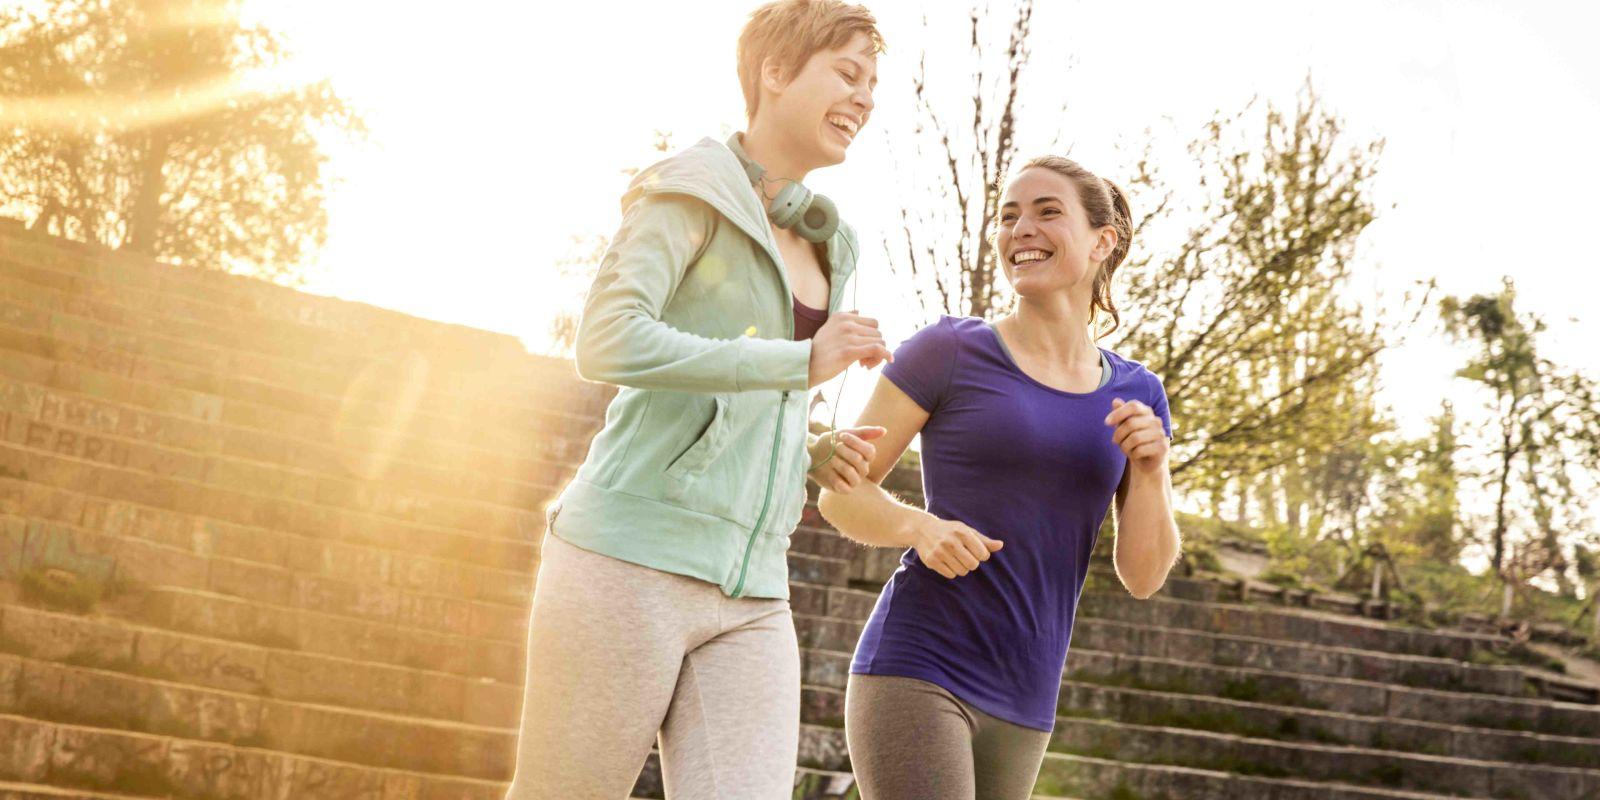 Study Finds That Regular Brisk Walking Is More Effective ...